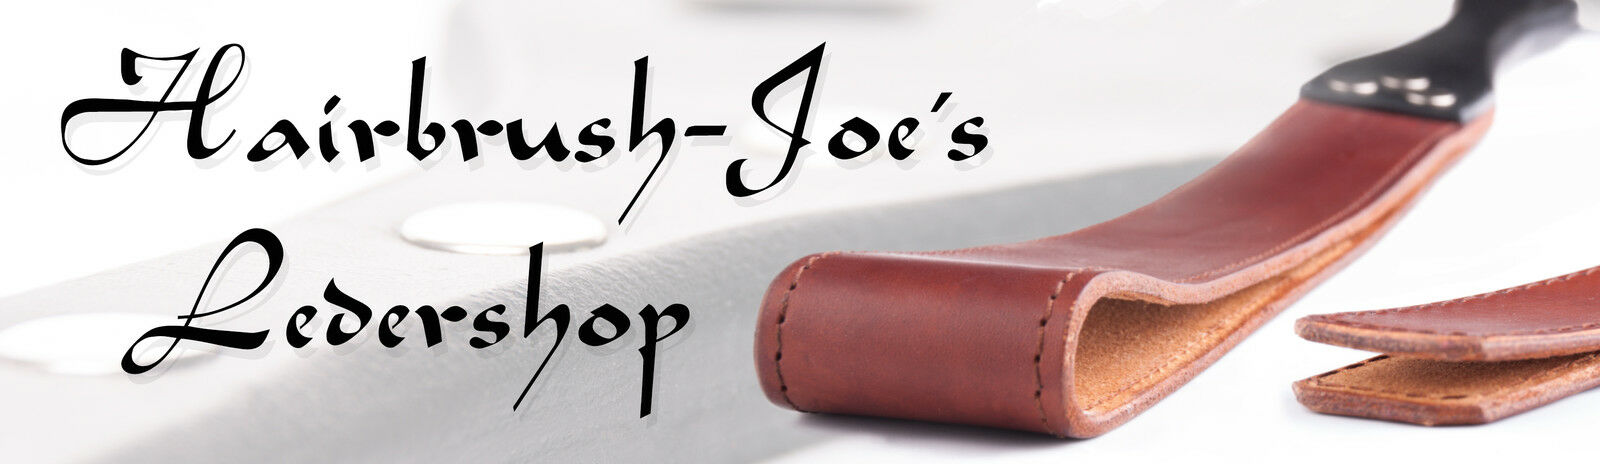 hairbrush-joes Ledershop